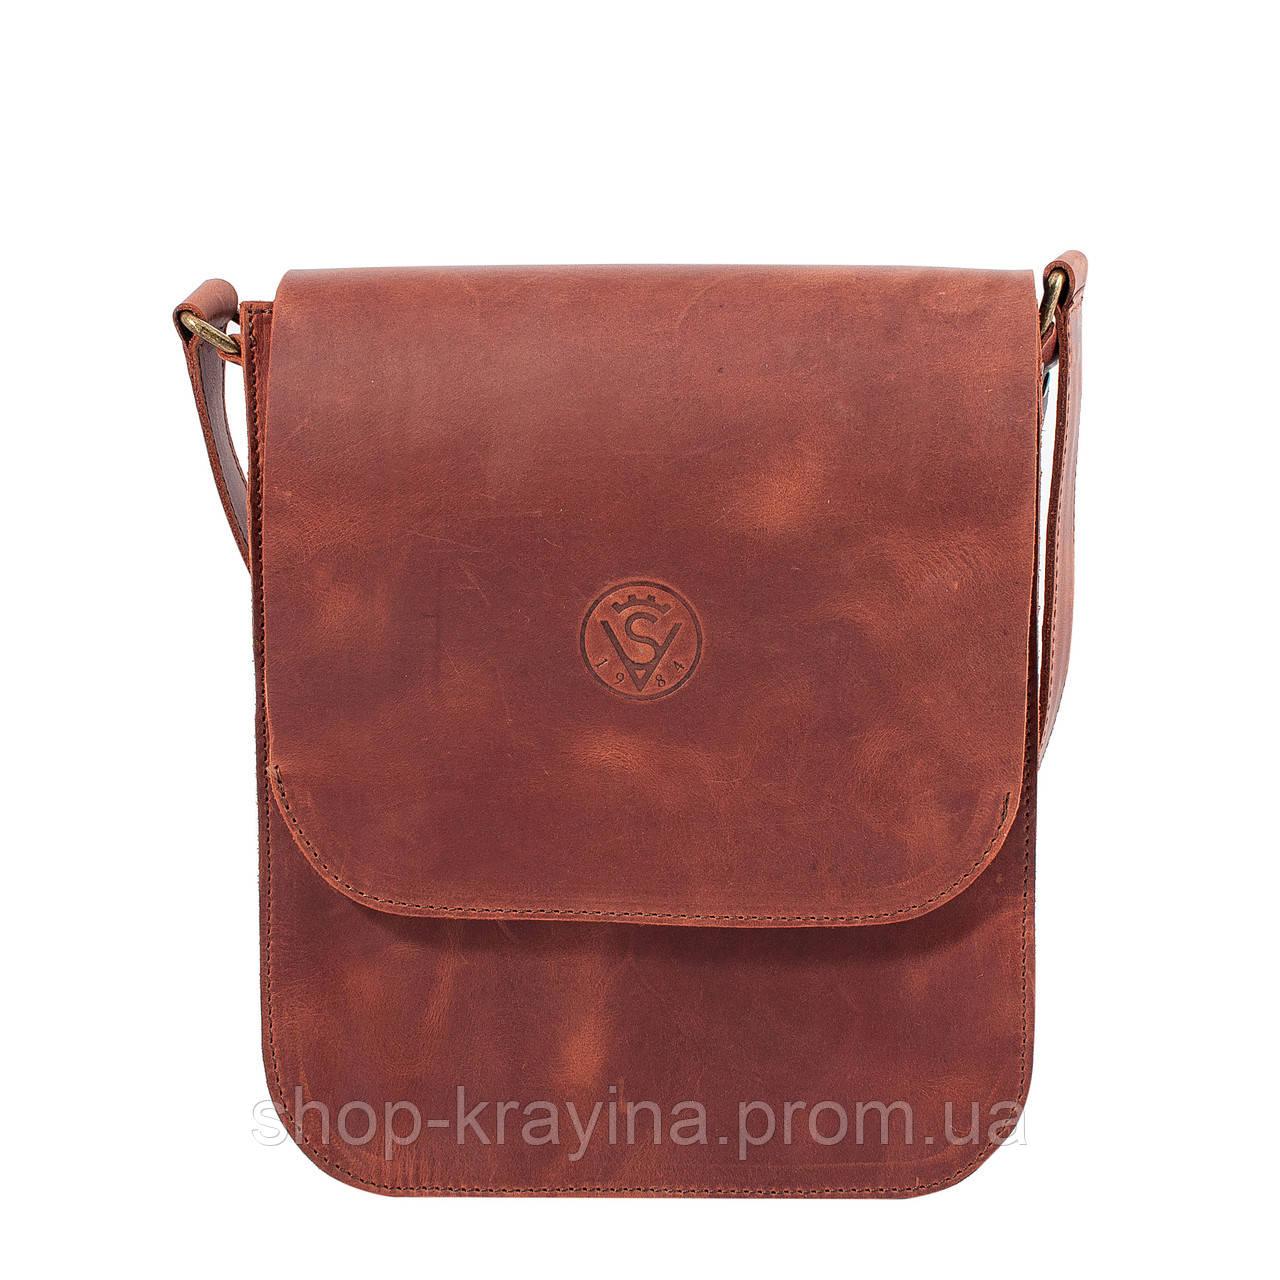 Кожаная мужская сумка VS214 Crazy horse ginger 20х23х5.5  см